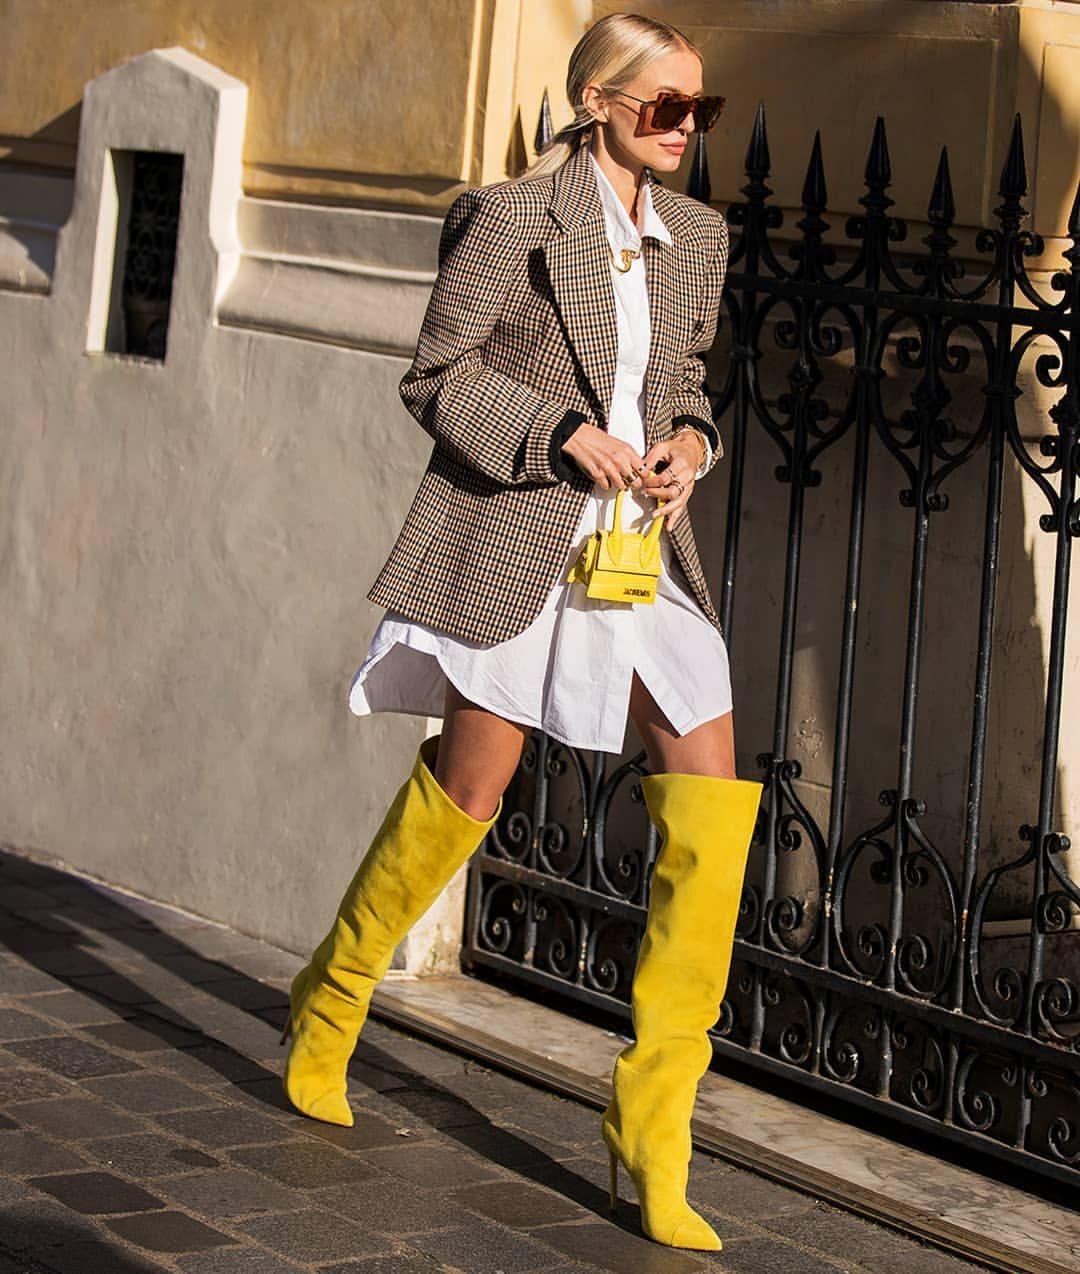 Leonie Hanne | Paris Now on THESTREETVIBE.com @leoniehanne… | Street style, Fashion, Style